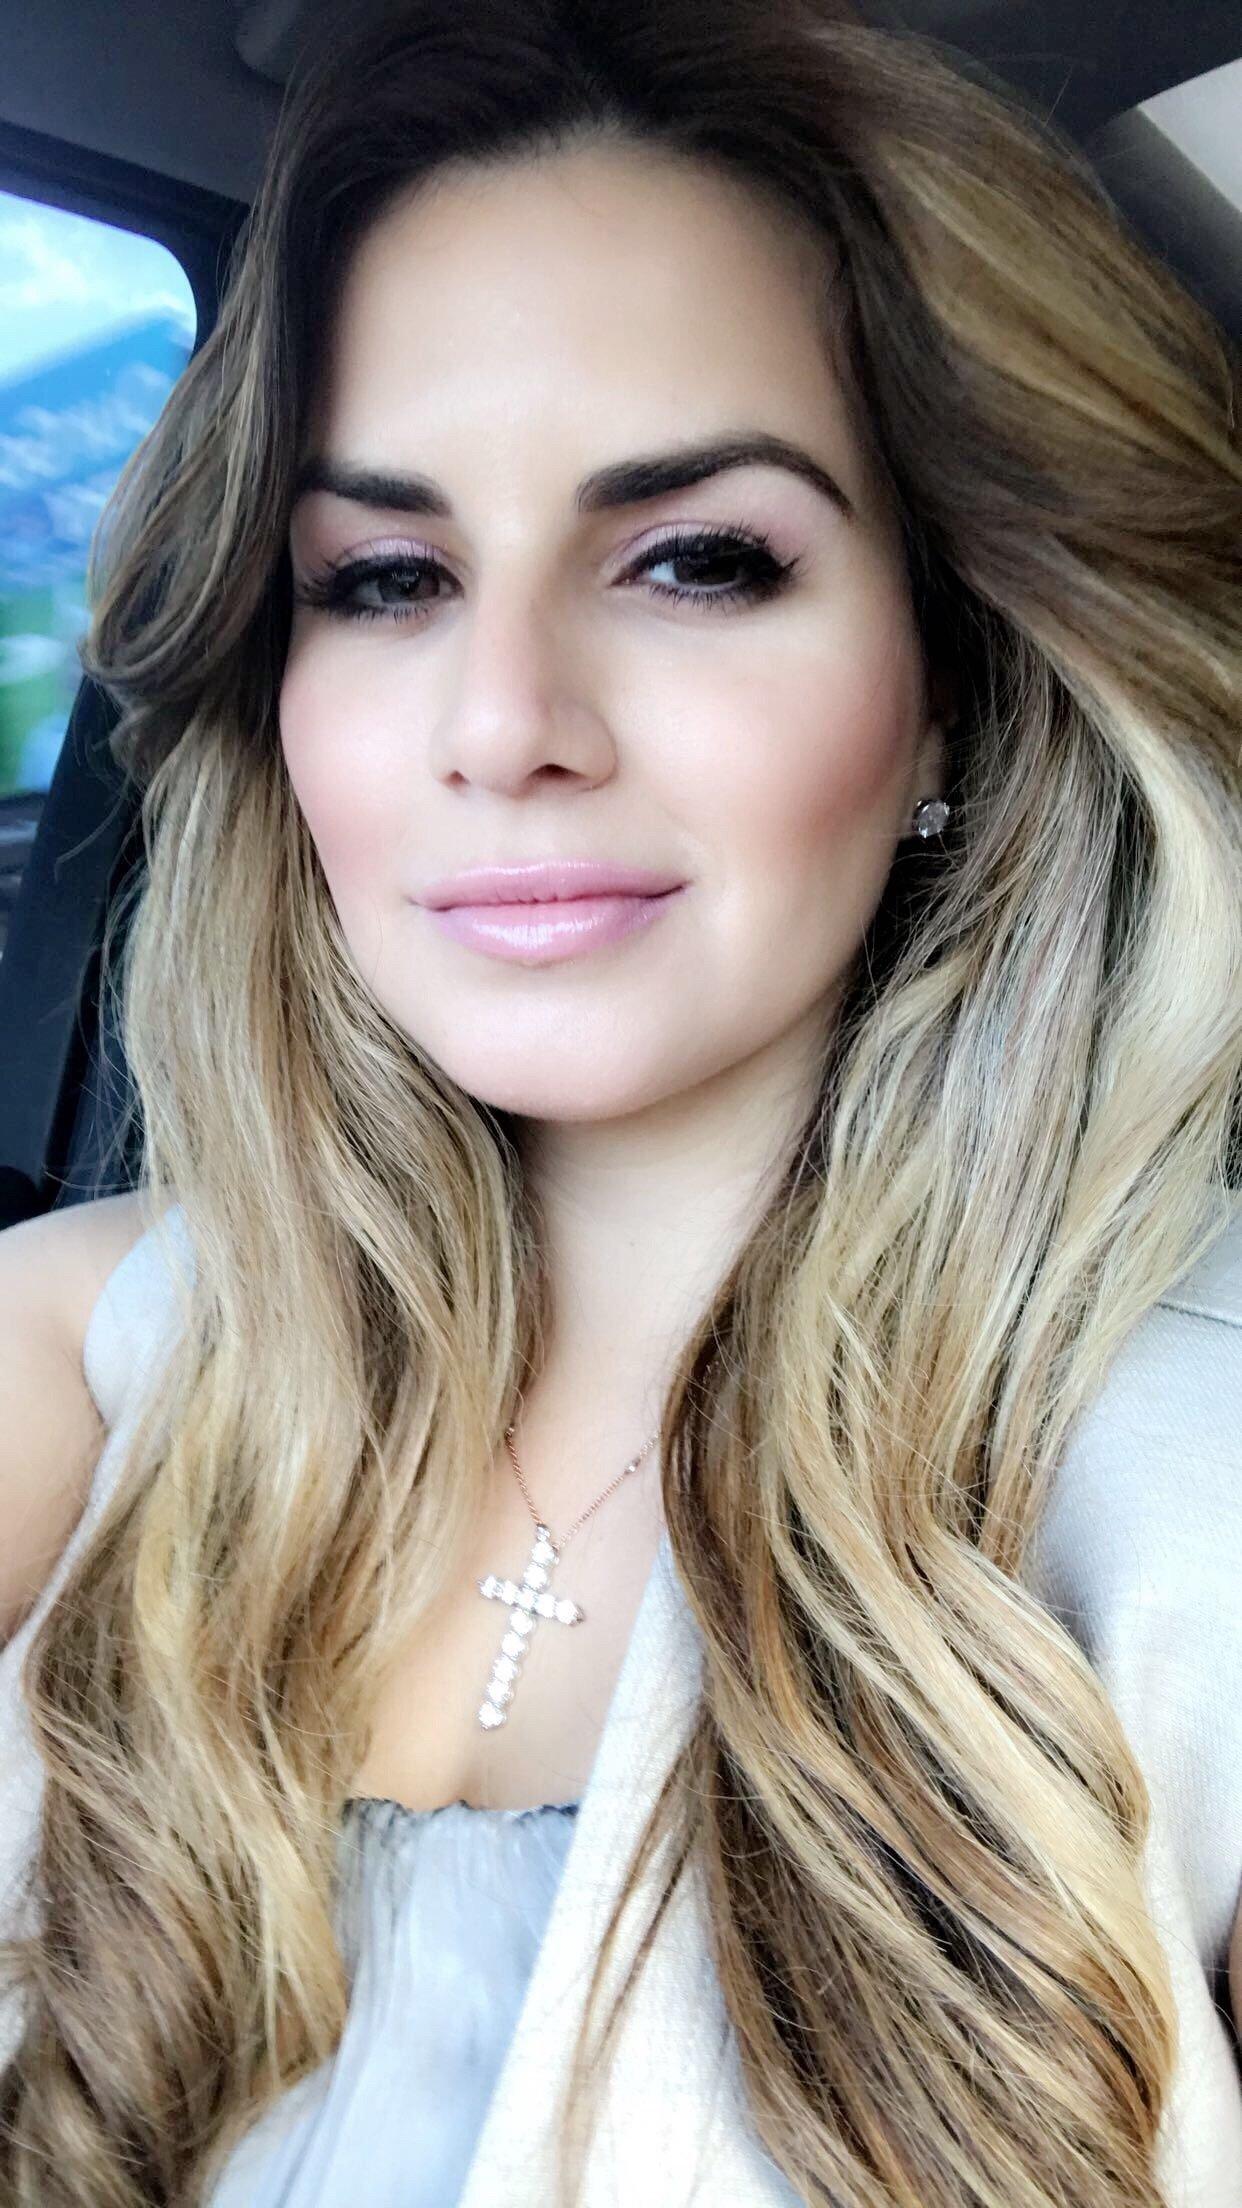 2019 Nataly Garcia nudes (65 images), Paparazzi